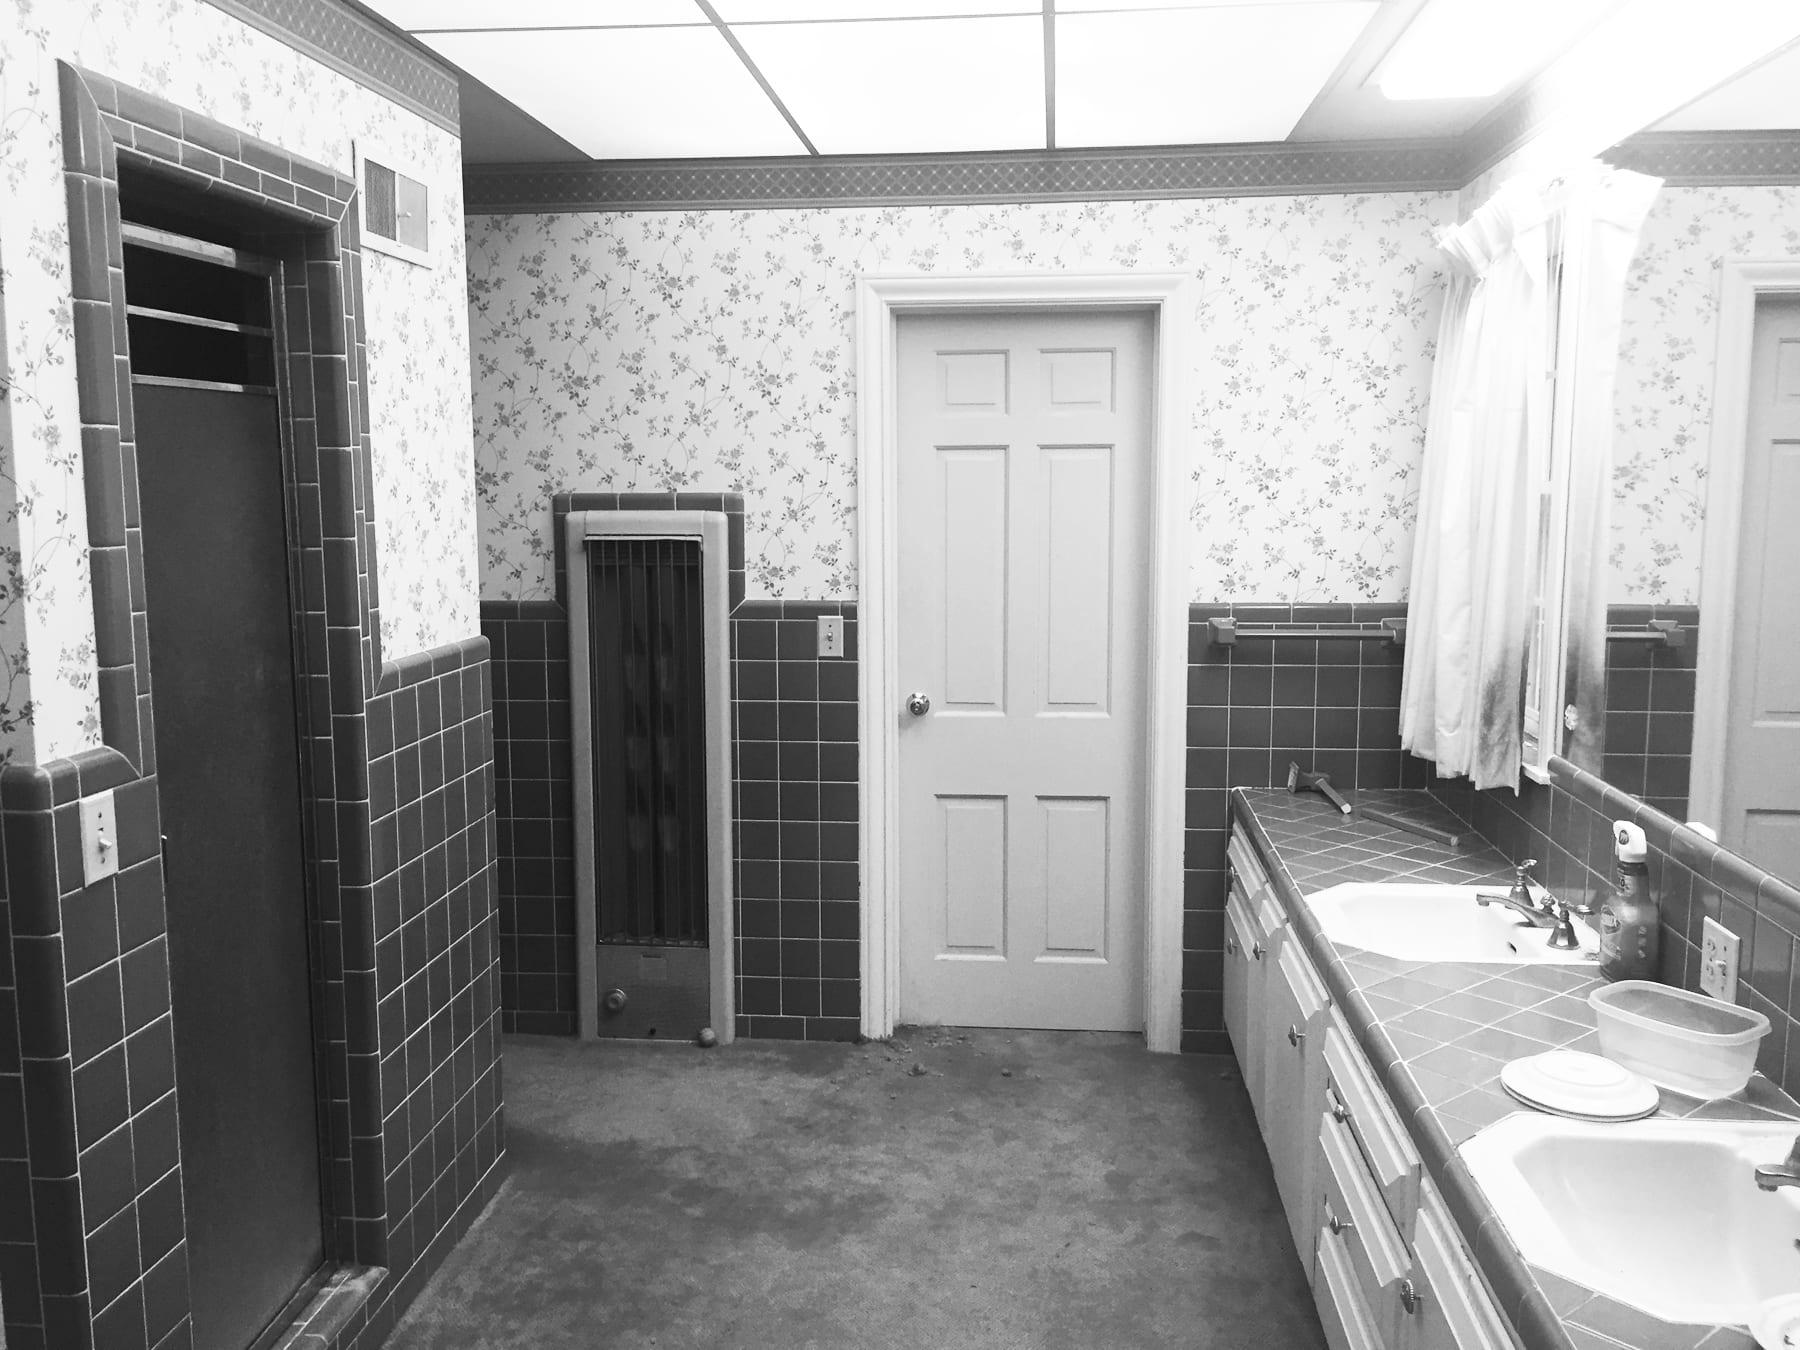 White apron latham - Before